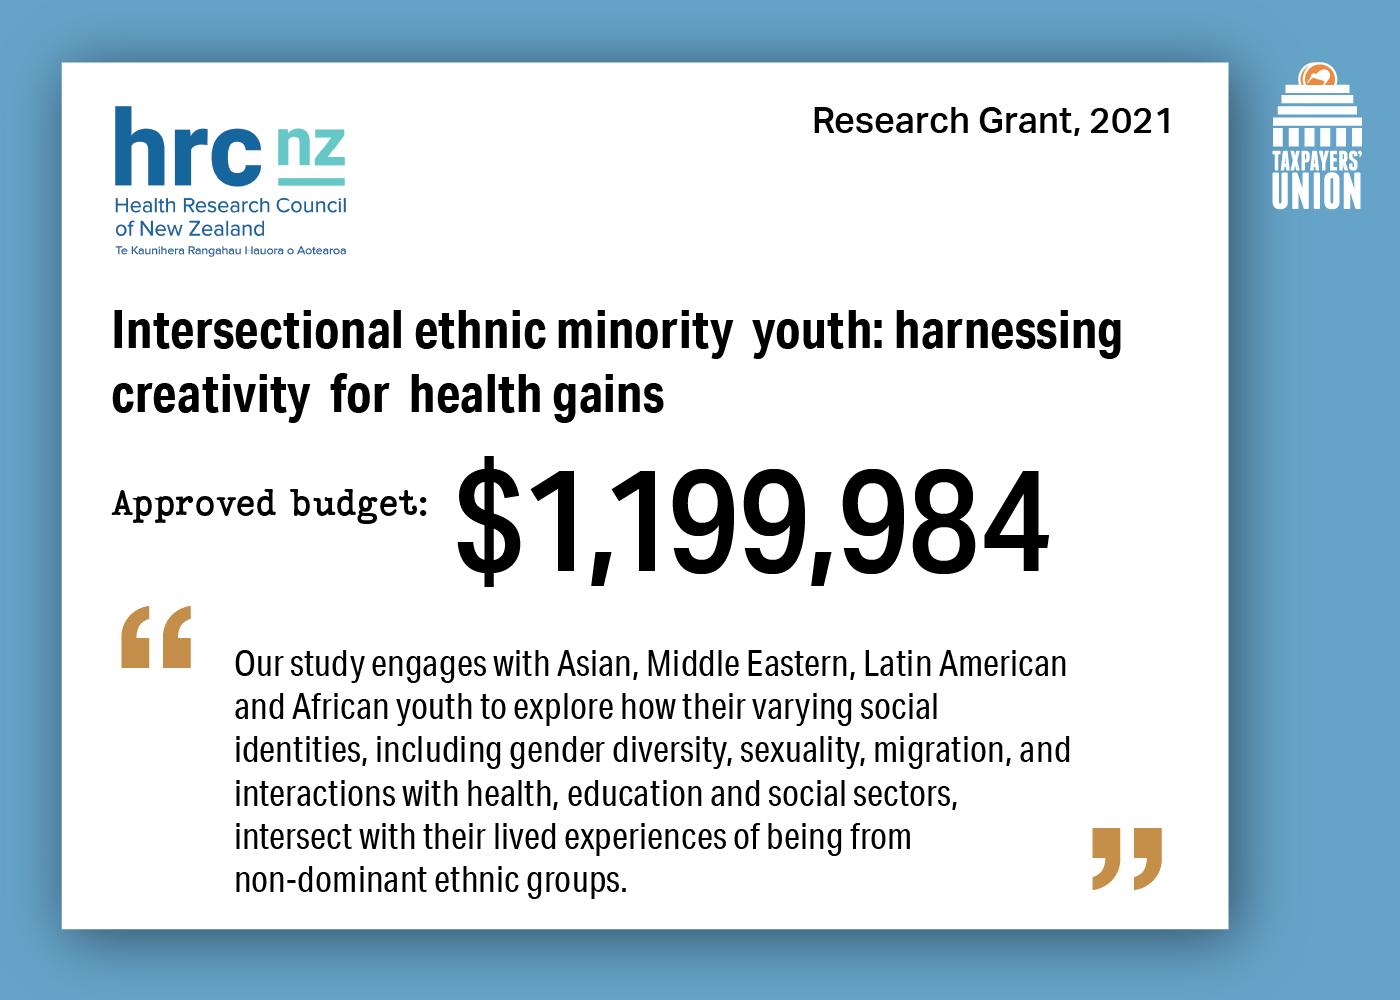 HRC grant image